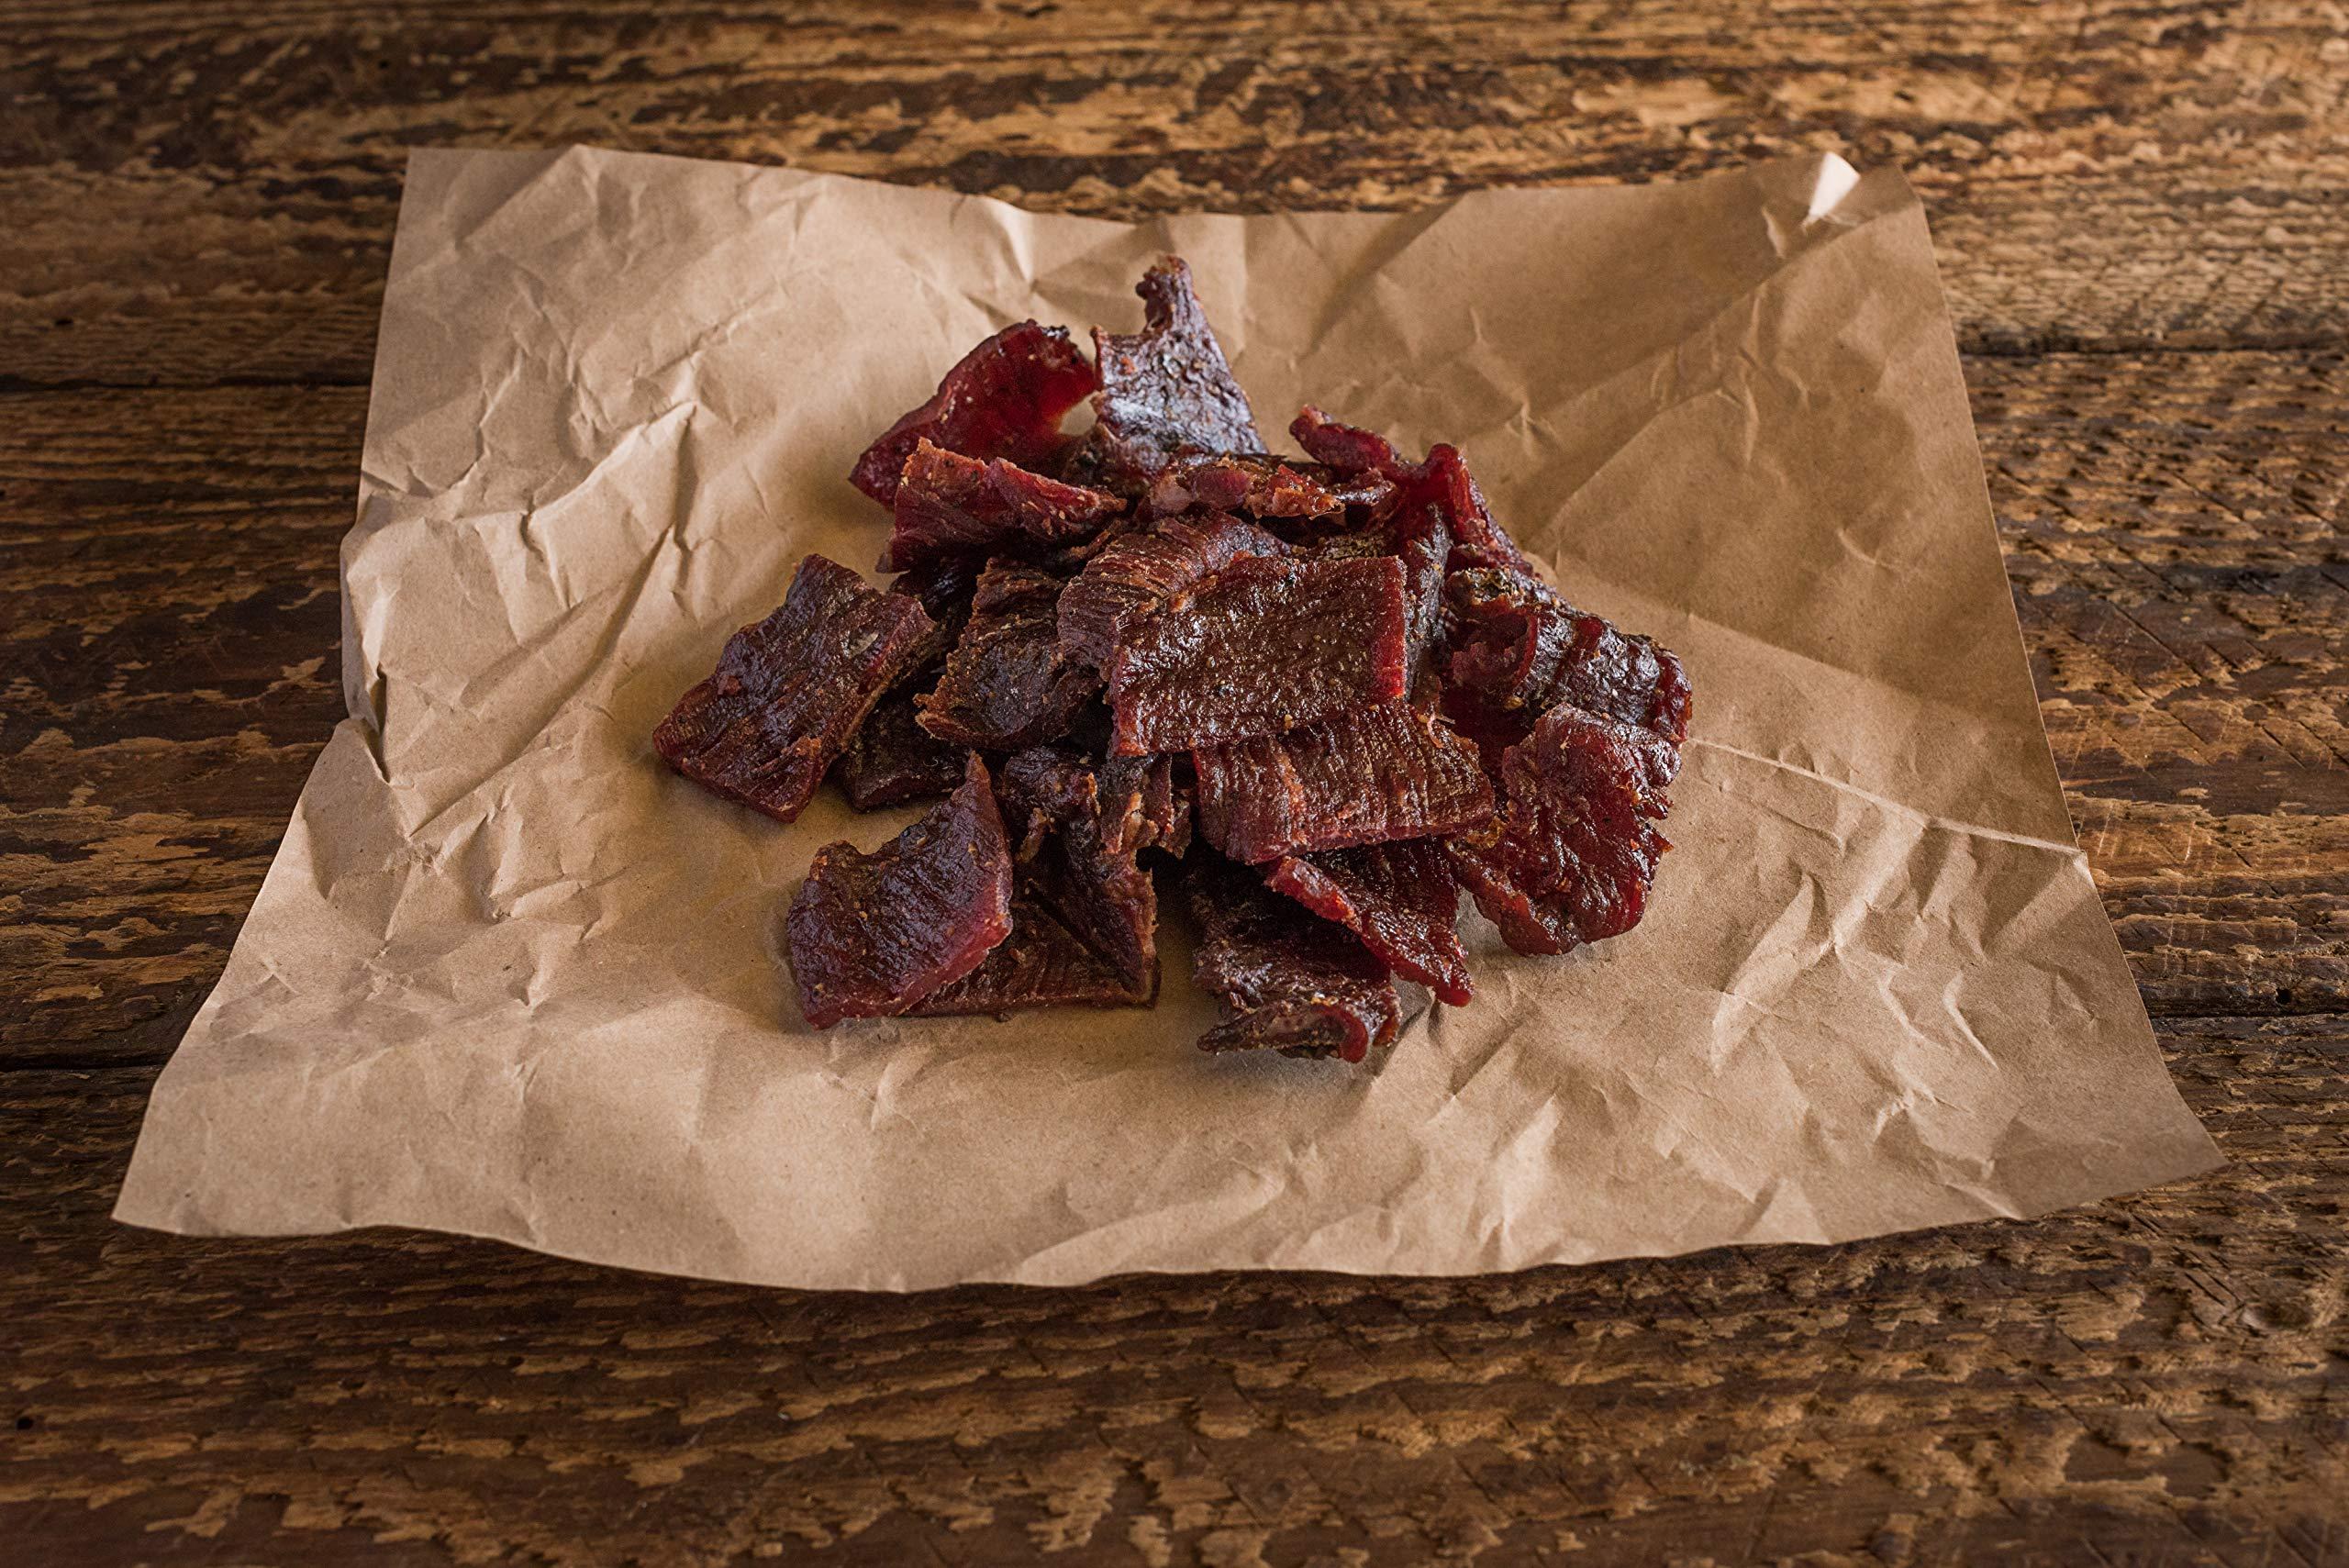 Tillamook Country Smoker All Natural, Real Hardwood Smoked Beef Jerky, Spicy & Sweet 10-oz Bag by Tillamook (Image #6)